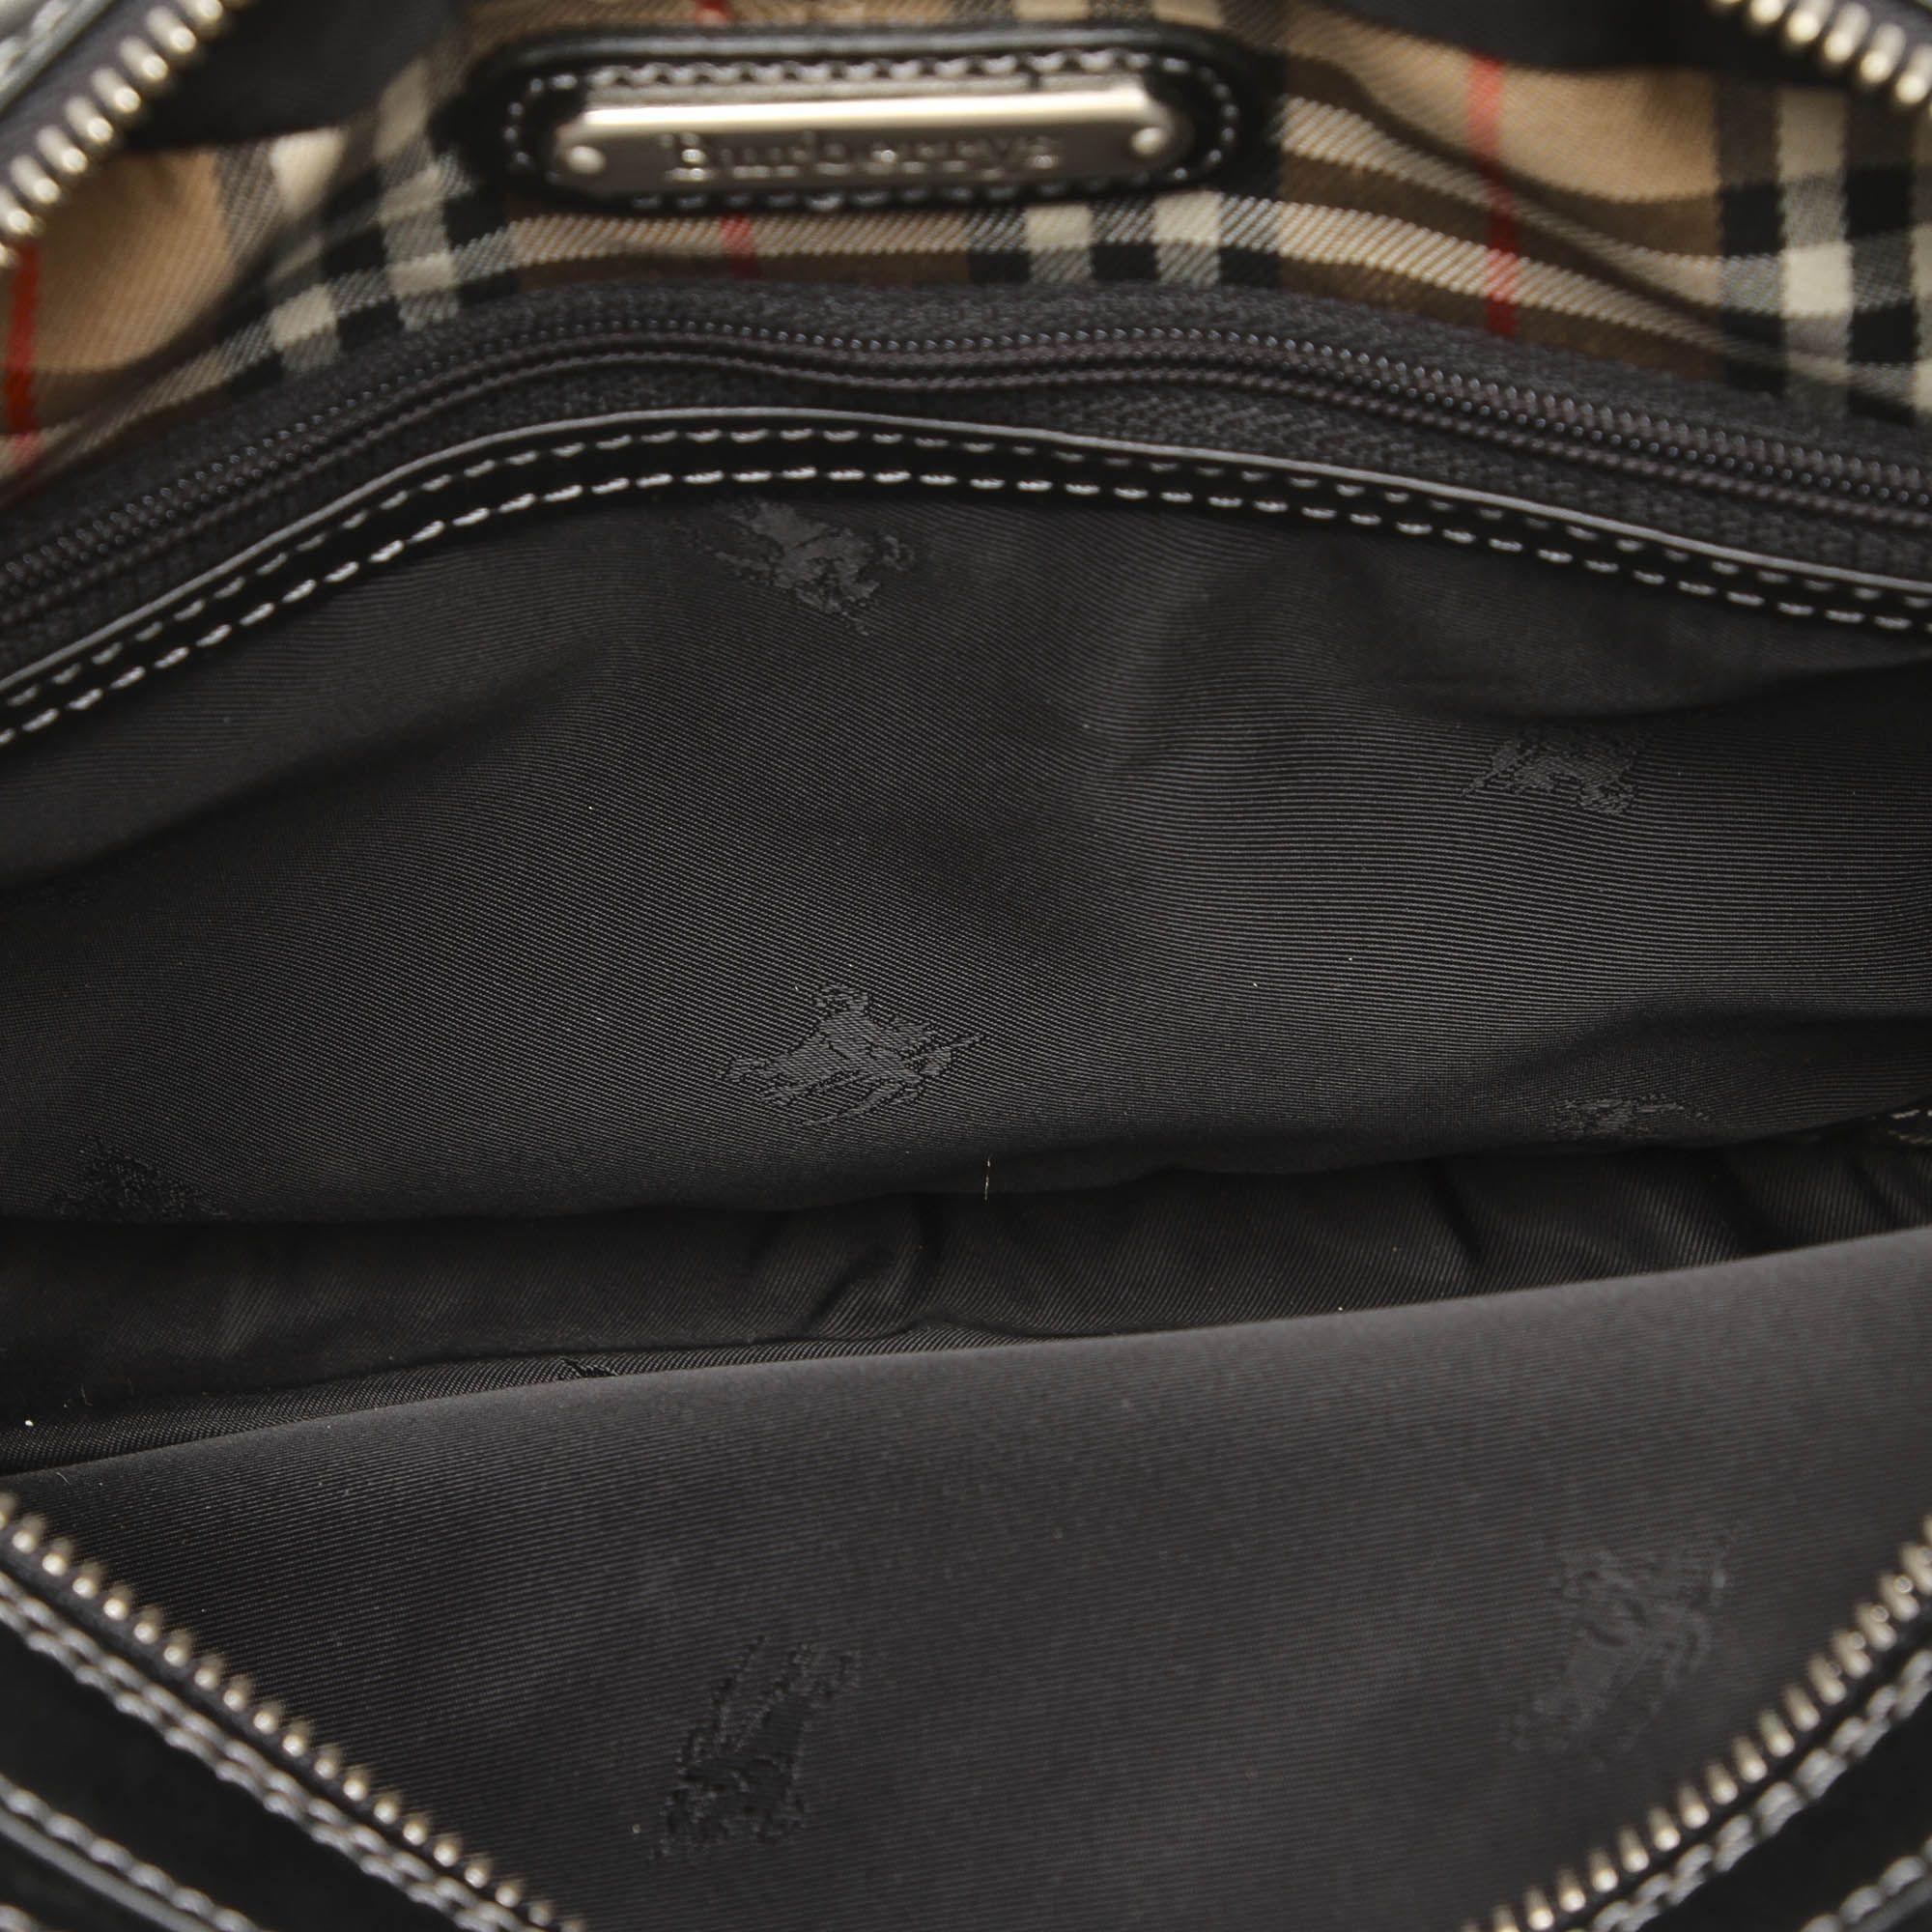 Vintage Burberry Leather Pouch Black